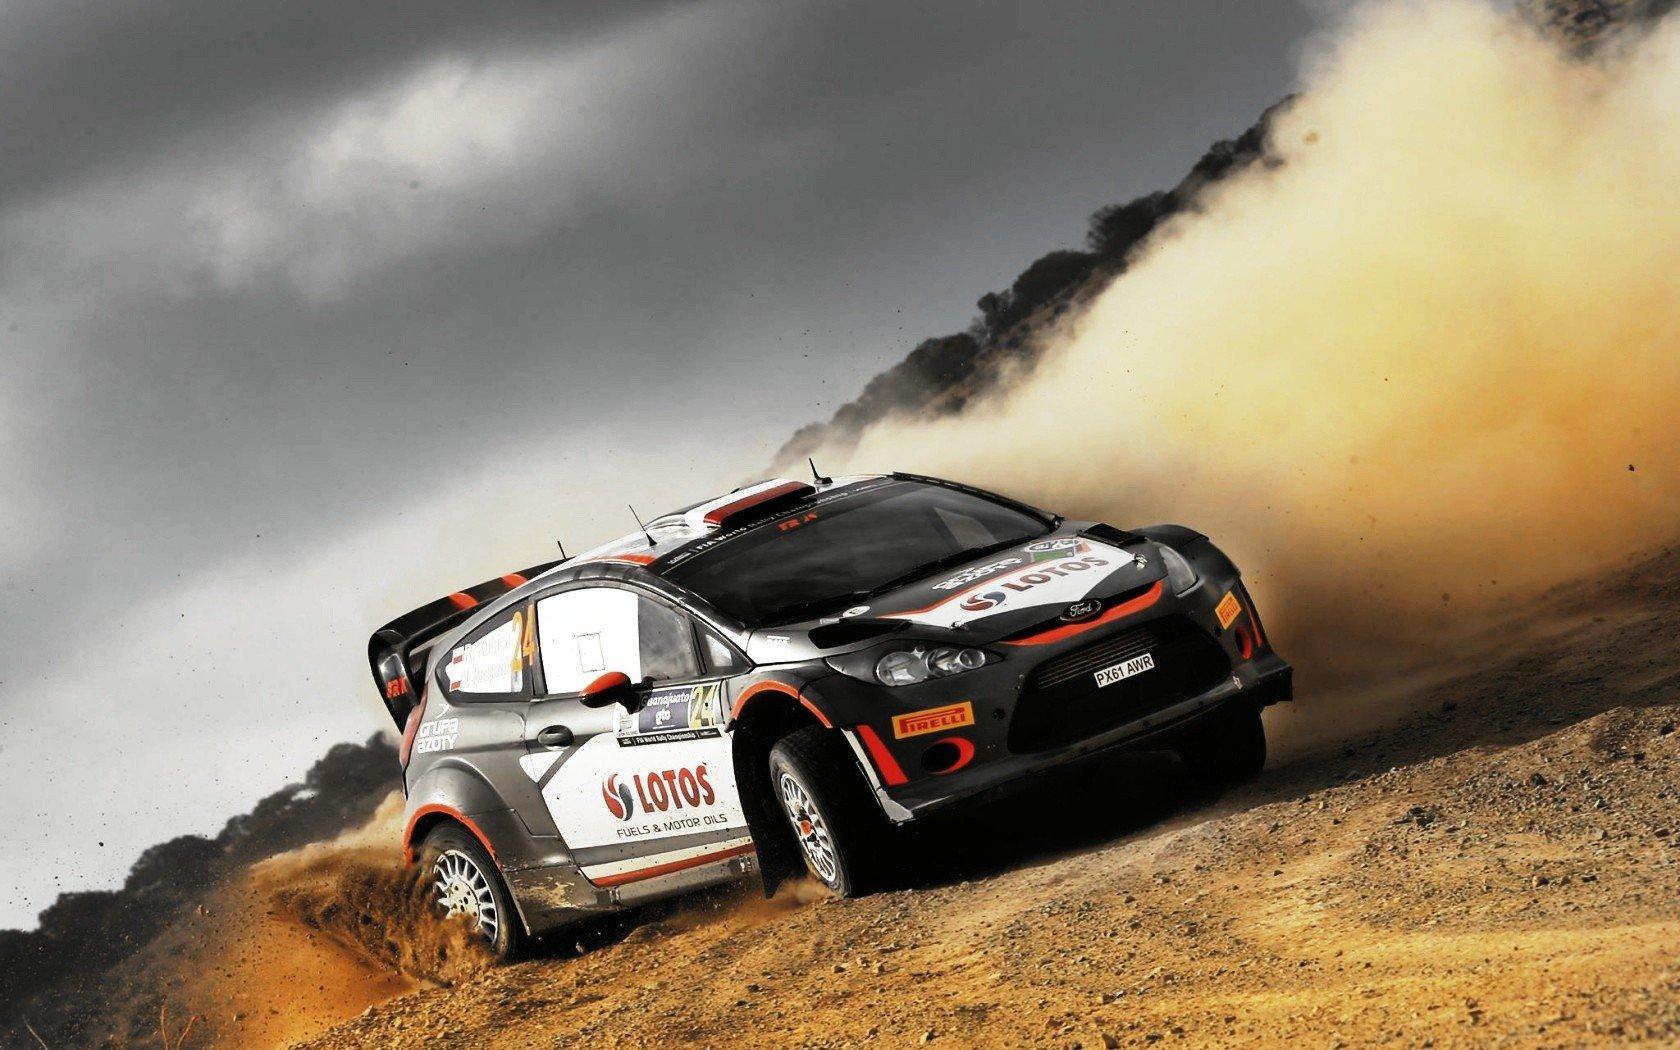 2017 - WRC.com®   FIA World Rally Championship